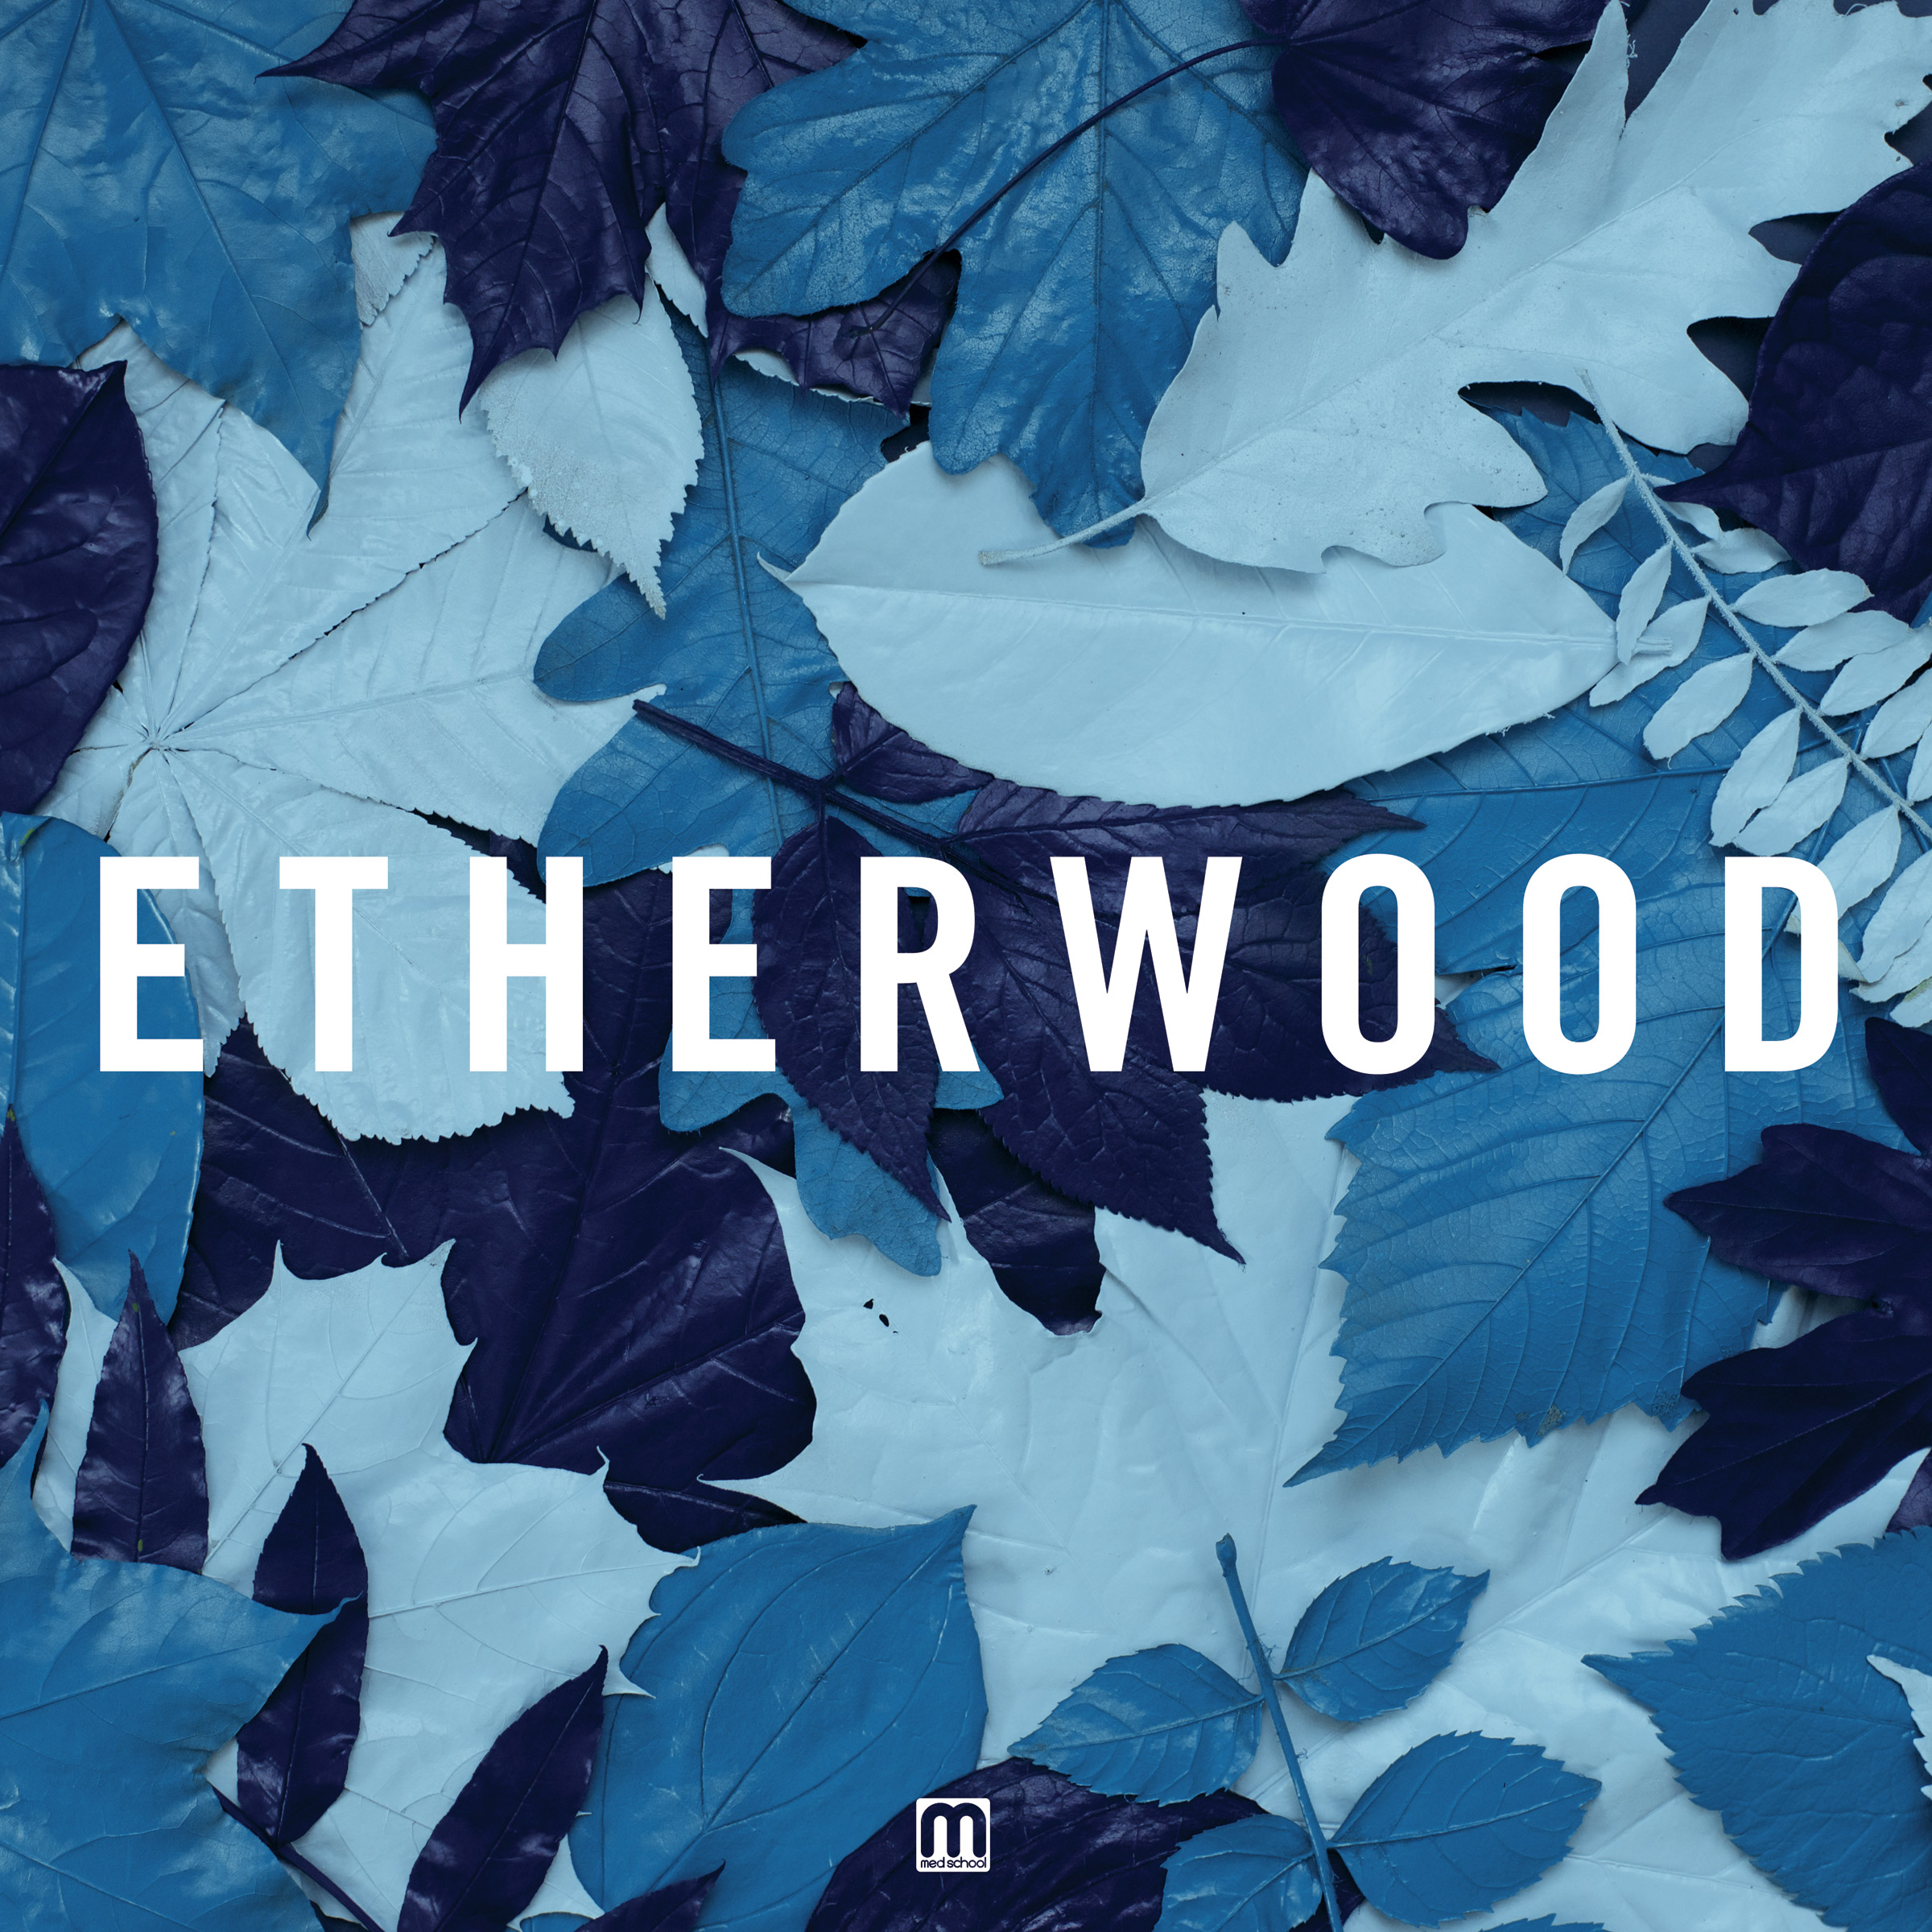 Etherwood/BLUE LEAVES CD